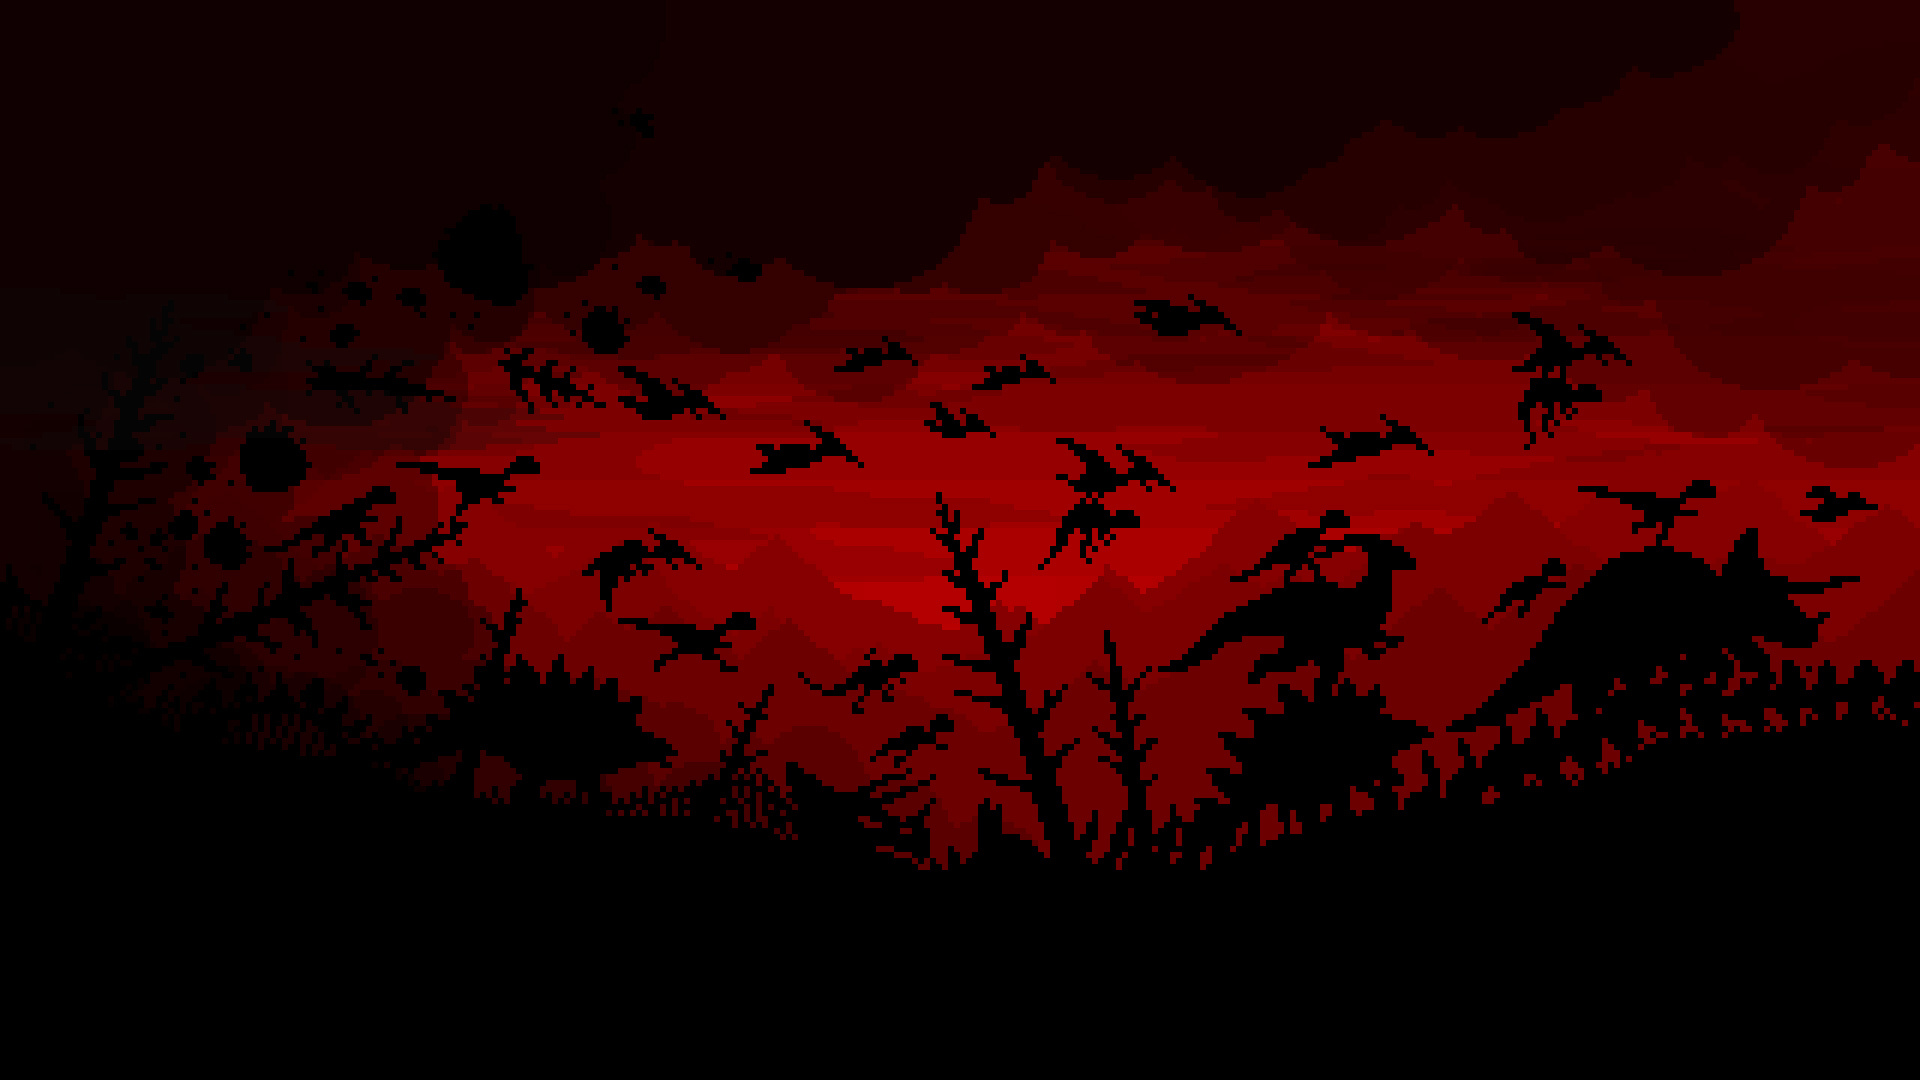 General 1920x1080 nature landscape digital art artwork trees prehistoric dinosaurs pixelated pixels pixel art